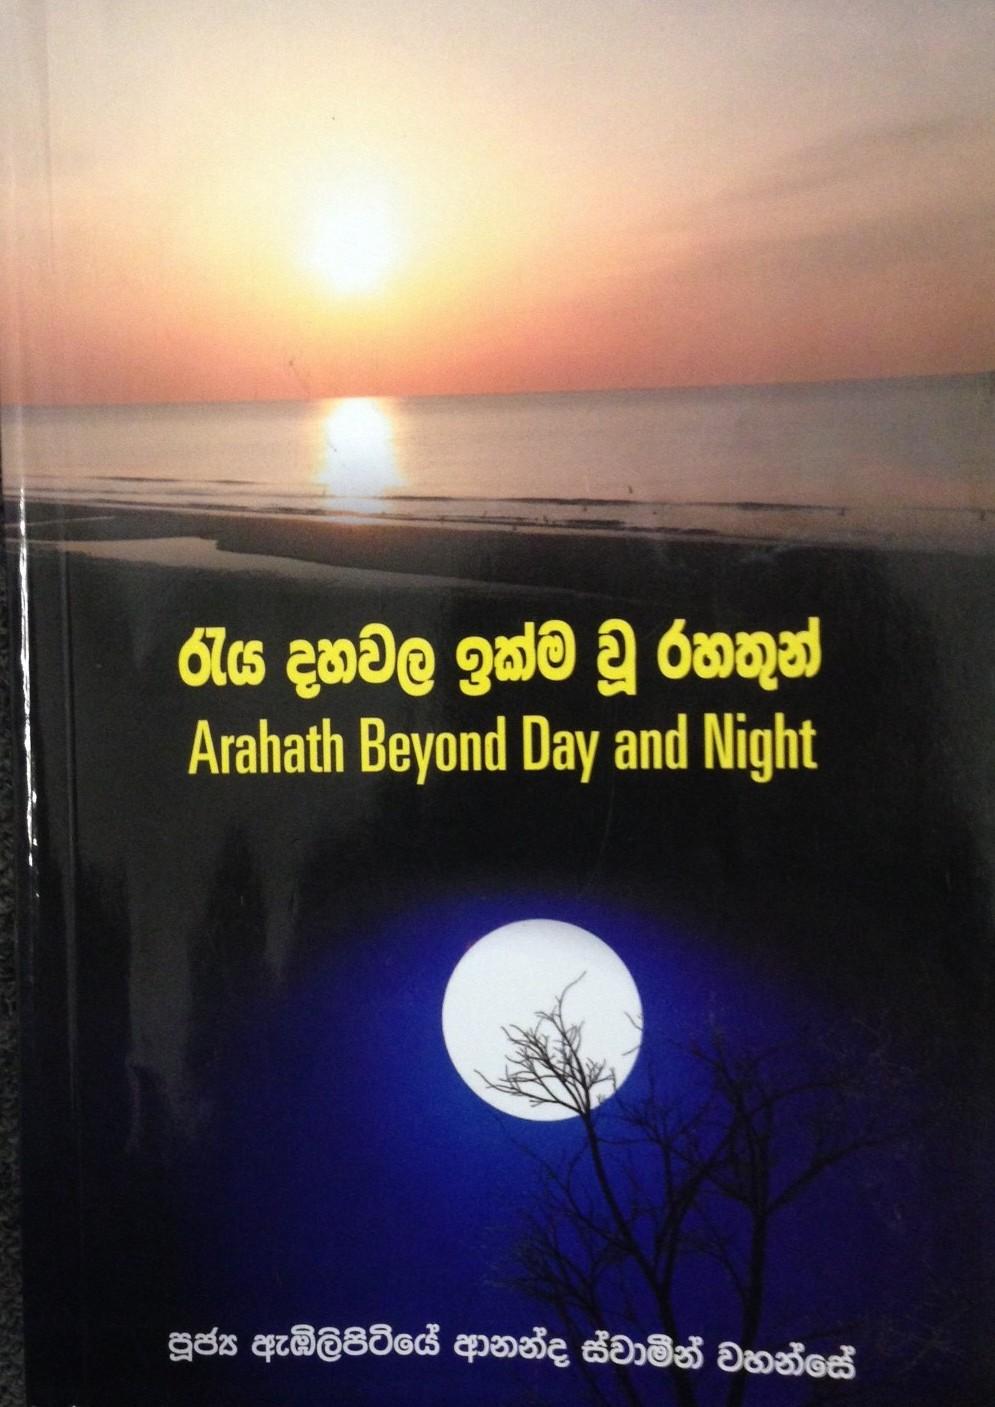 Aratath Beyond Day and Night